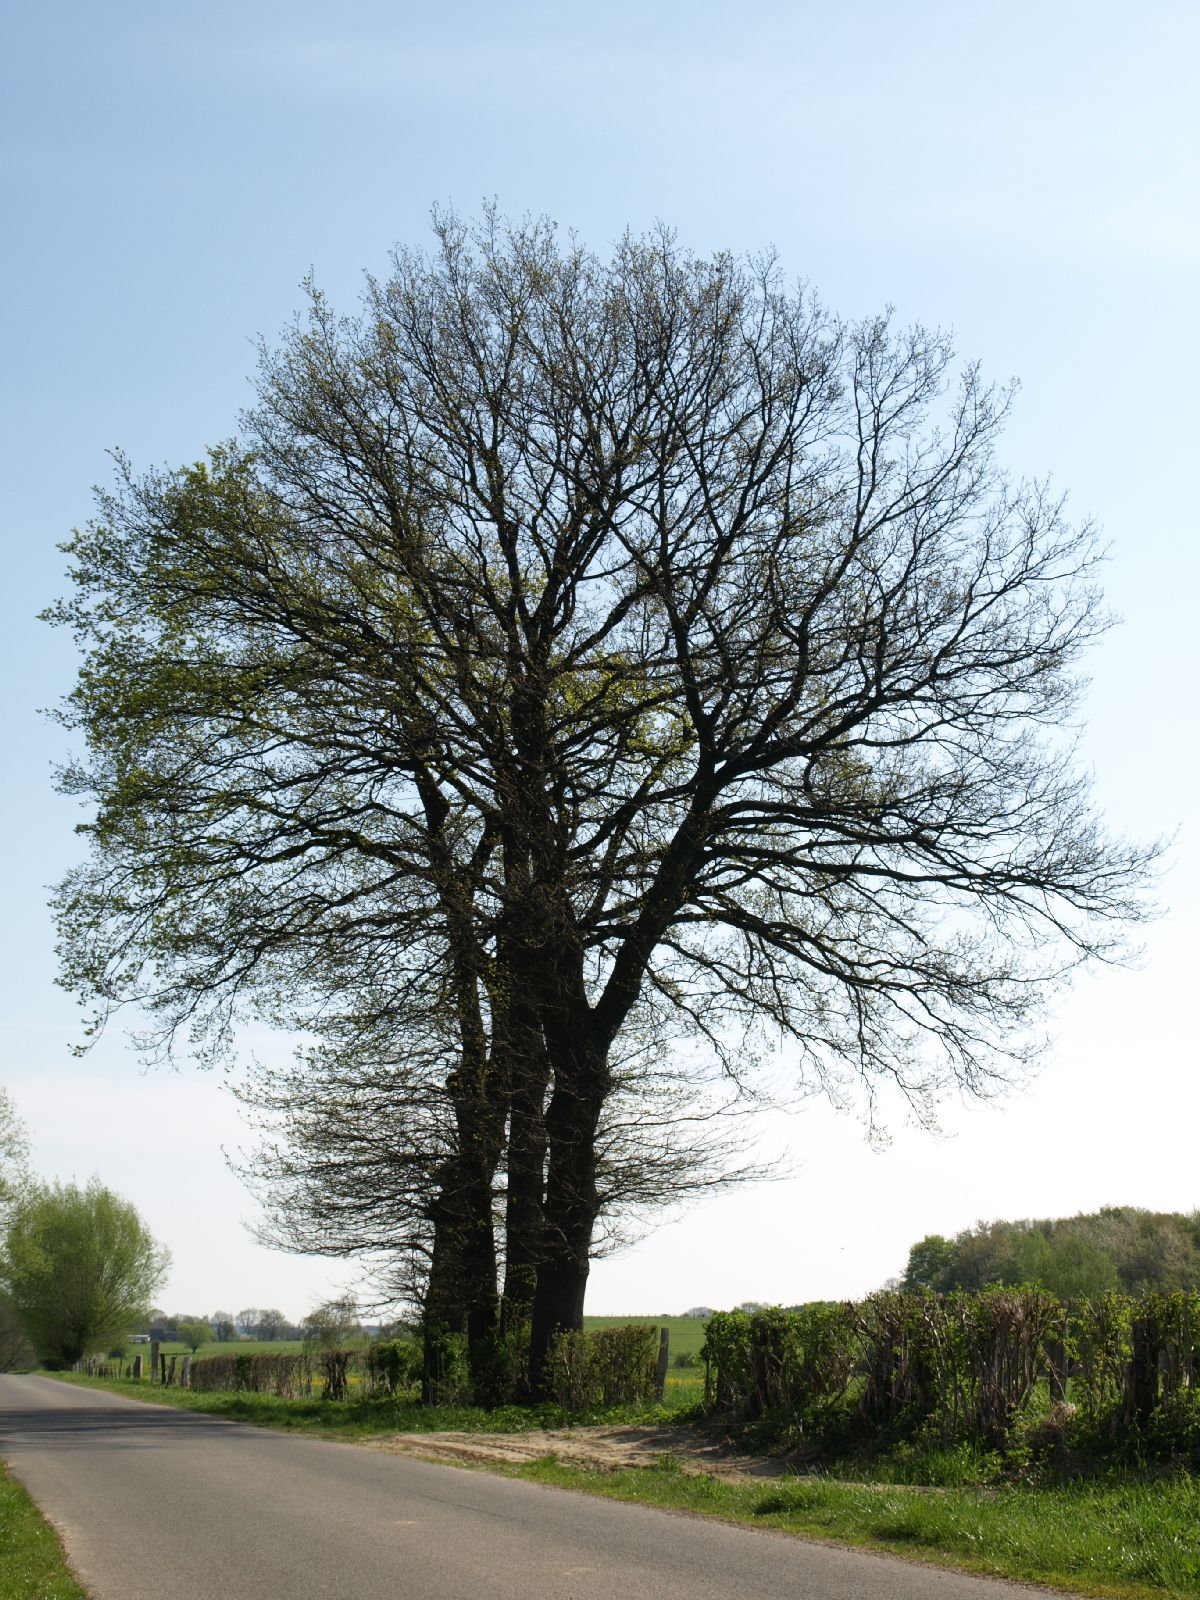 Pflanzen-Baum-Foto_Textur_B_P5042367